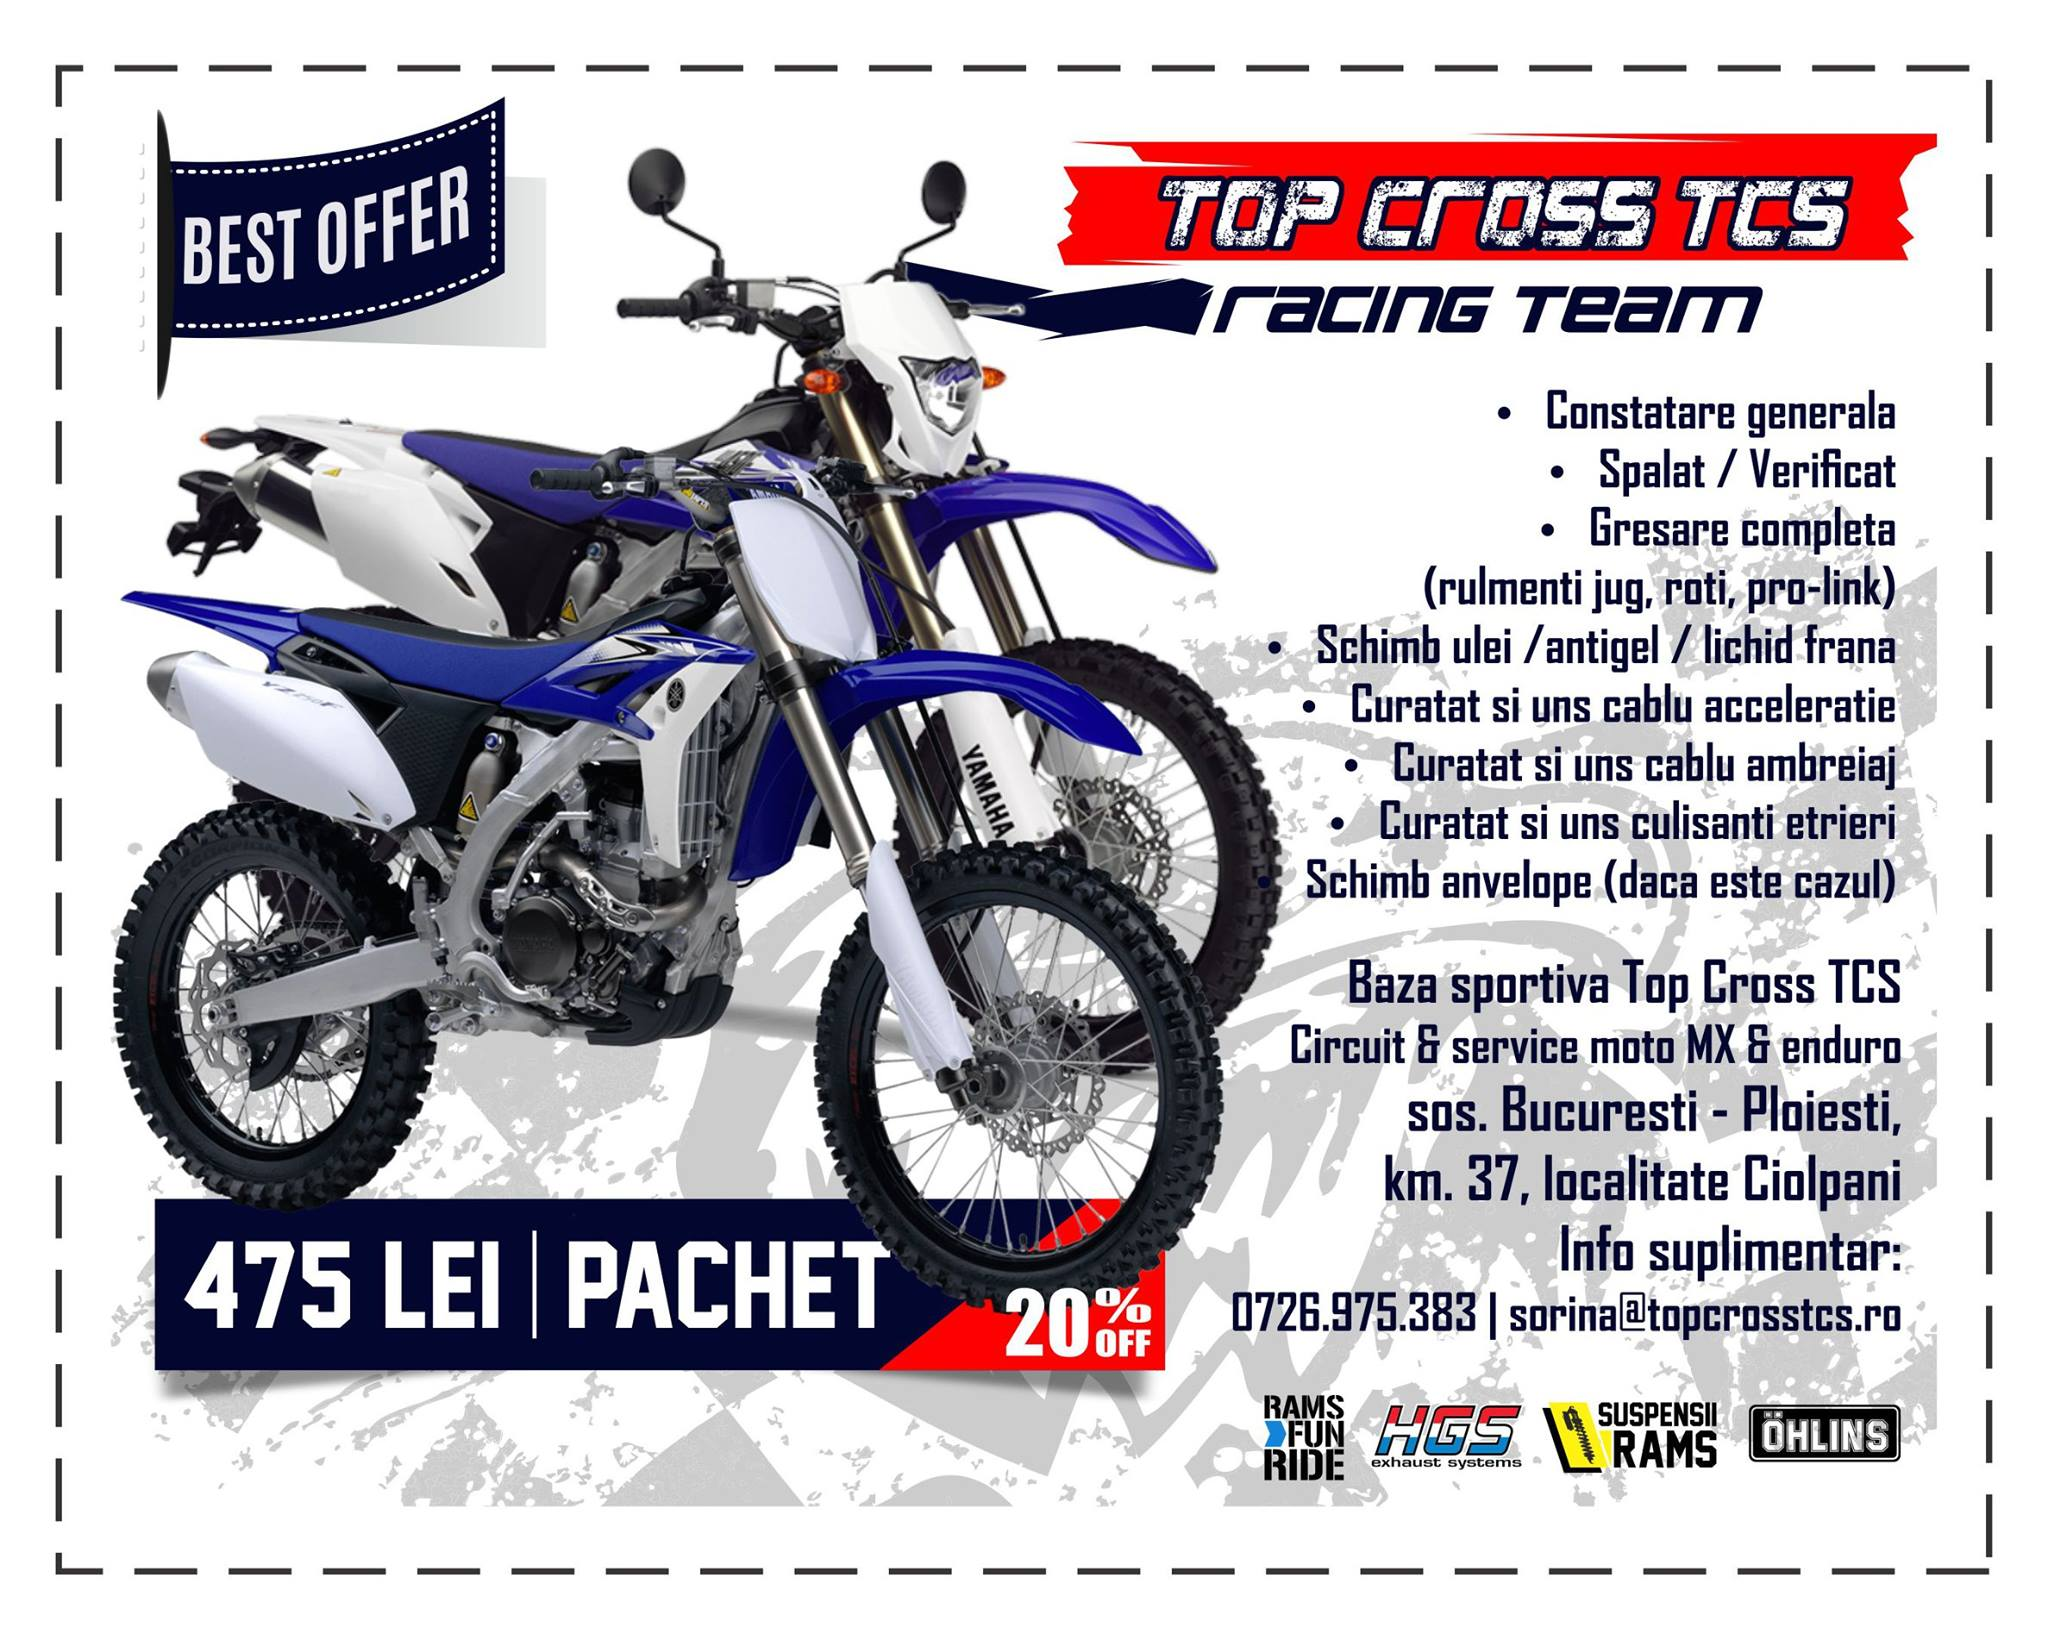 service motociclete pachet revizie